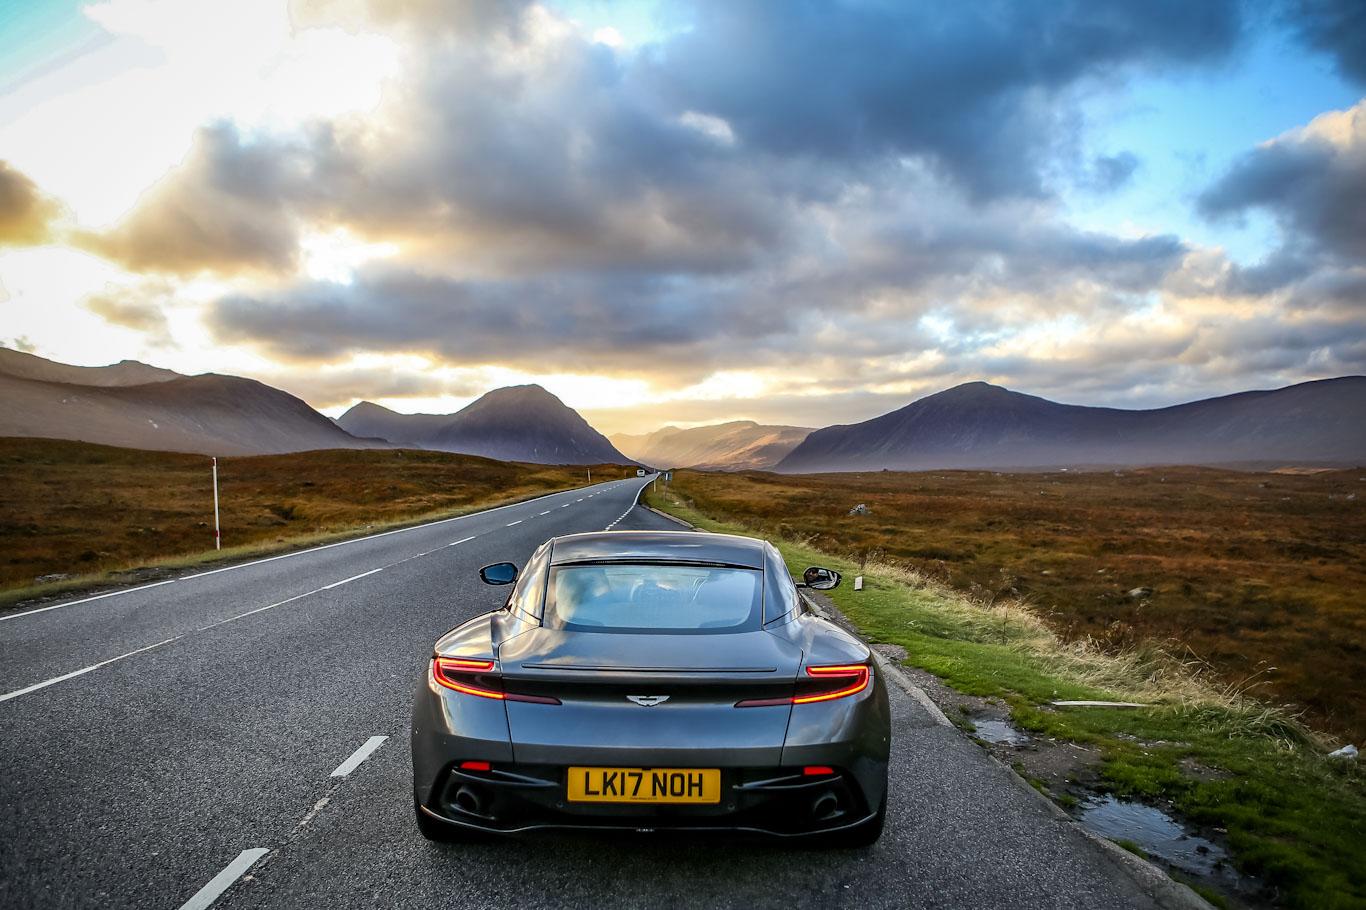 Scenic Drives UK - A82 Scotland & Glencoe